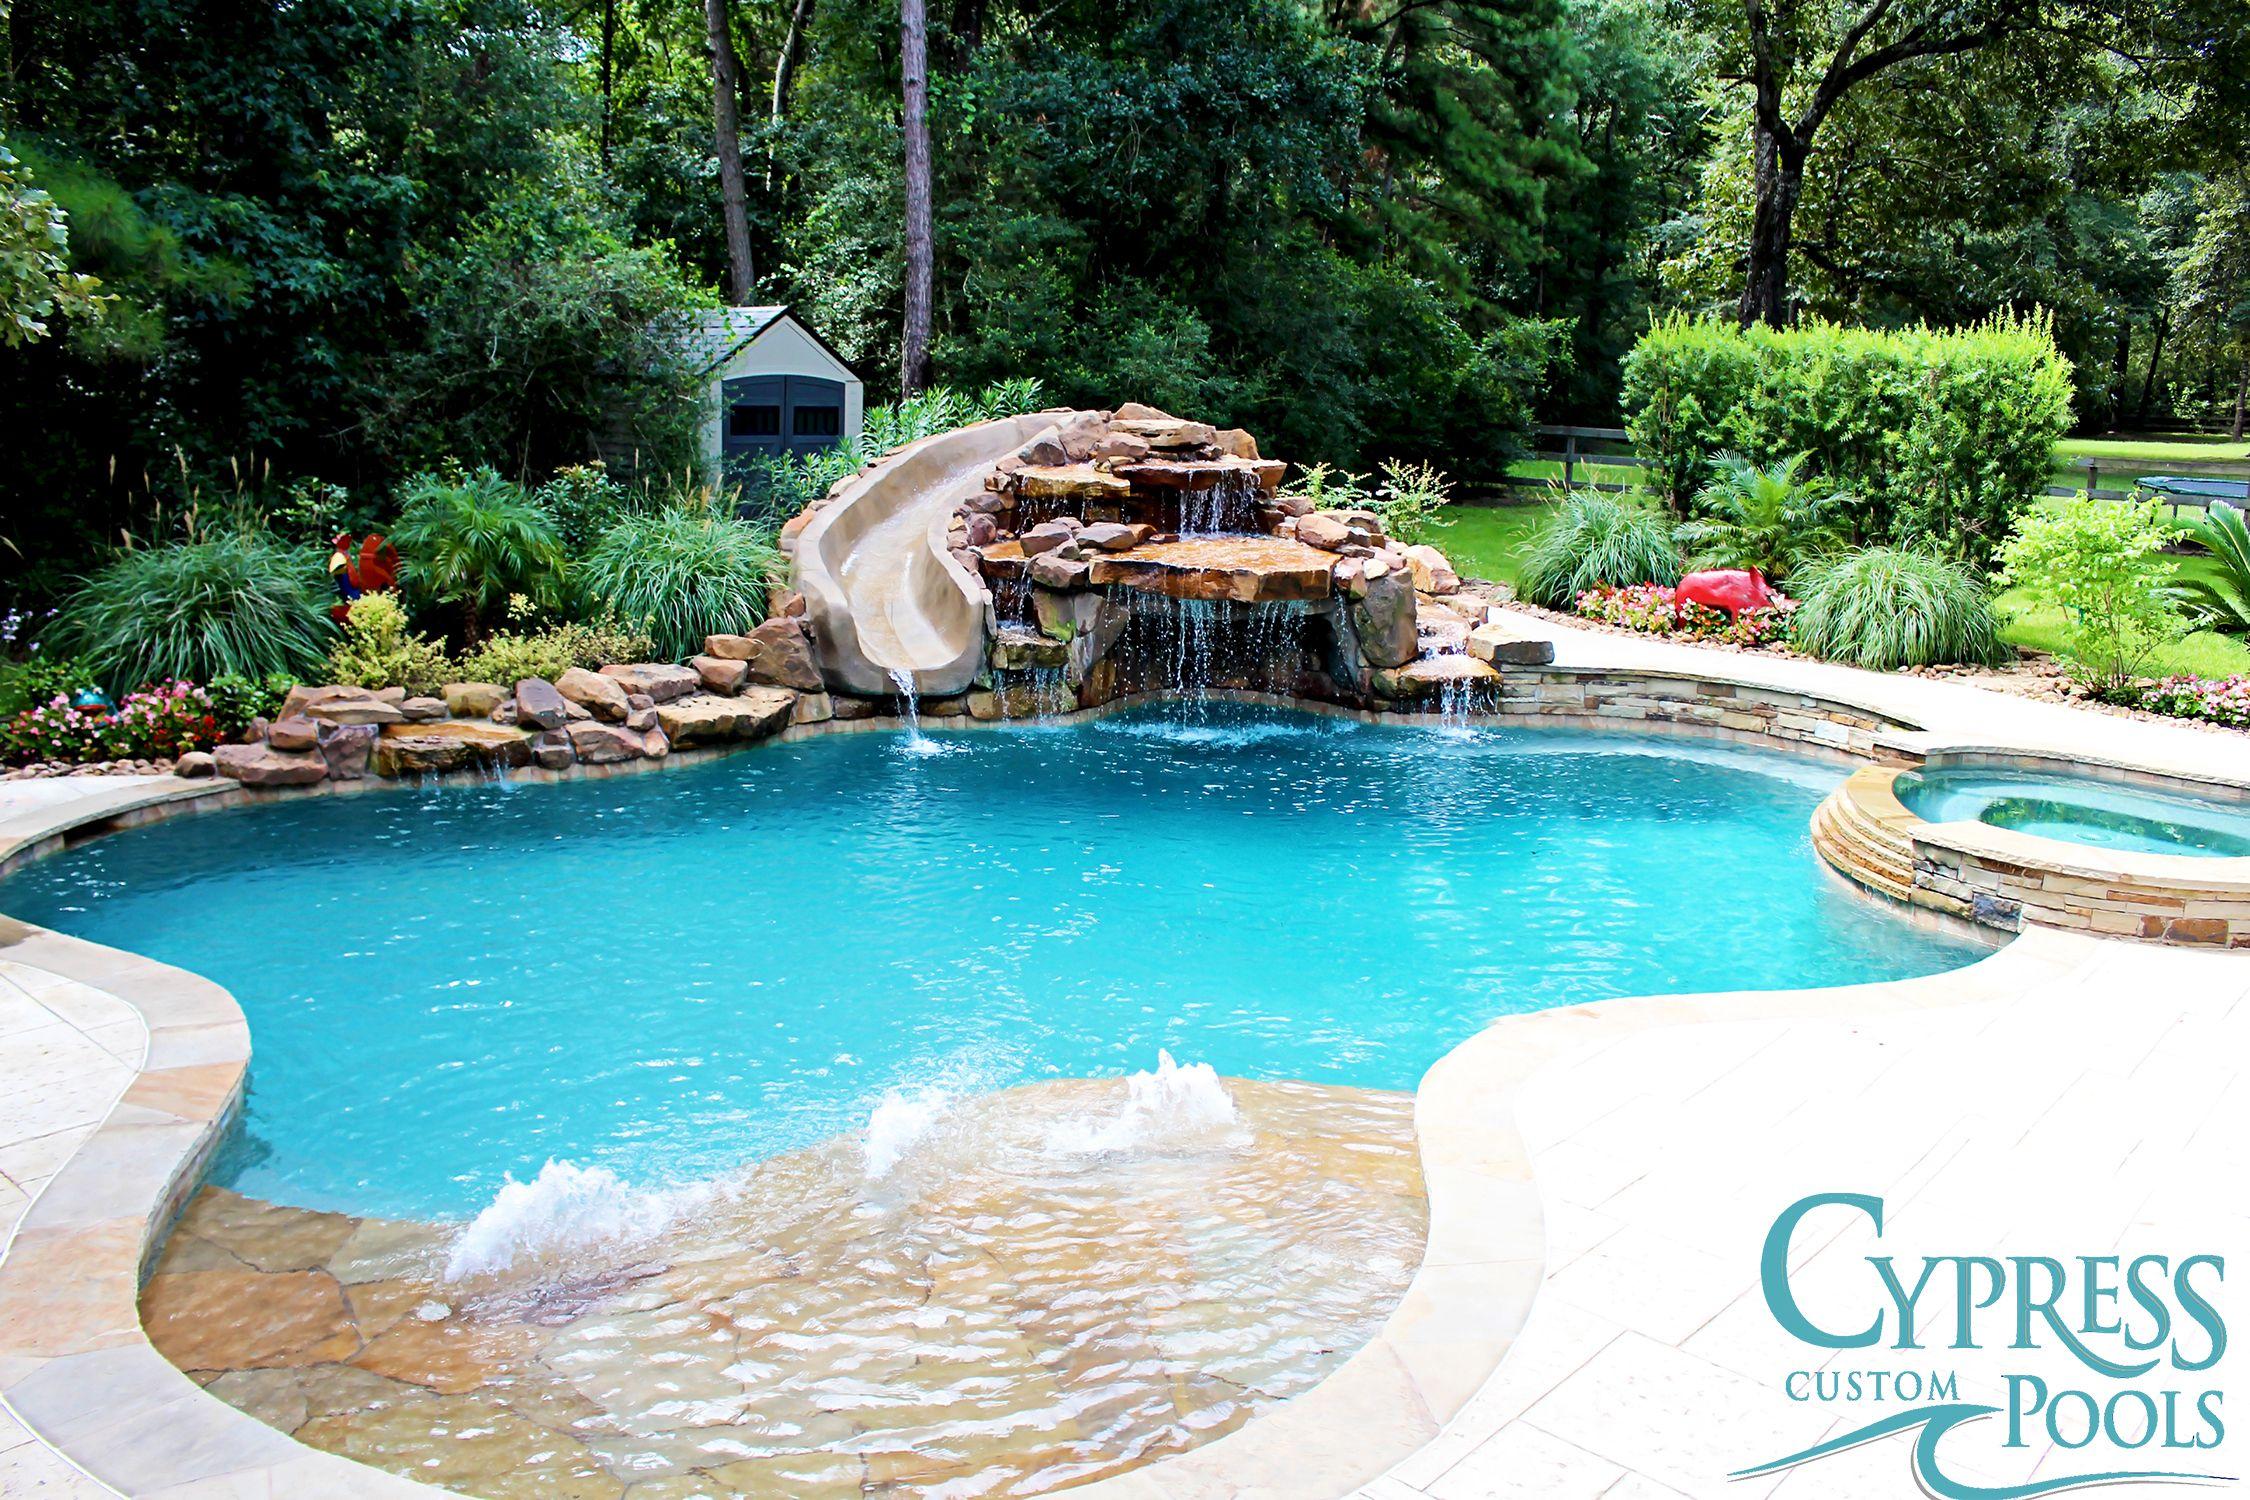 Wright 79 Jpg 2250 1500 Custom Pools Pools Backyard Inground